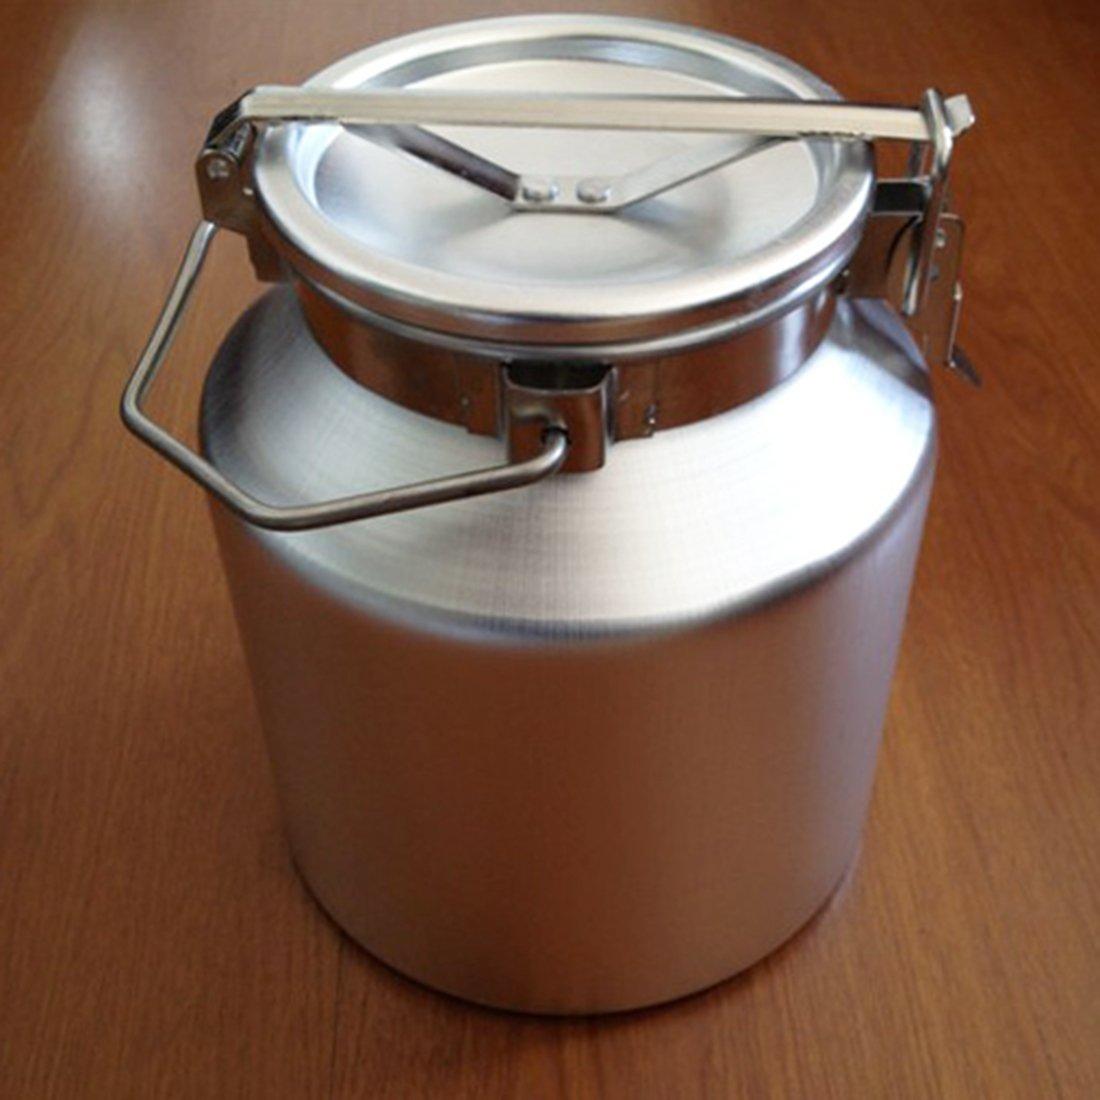 Rhegeneshop Aluminum Alloy Milk Can Wine Pail Bucket Tote Jug Lid 5 L